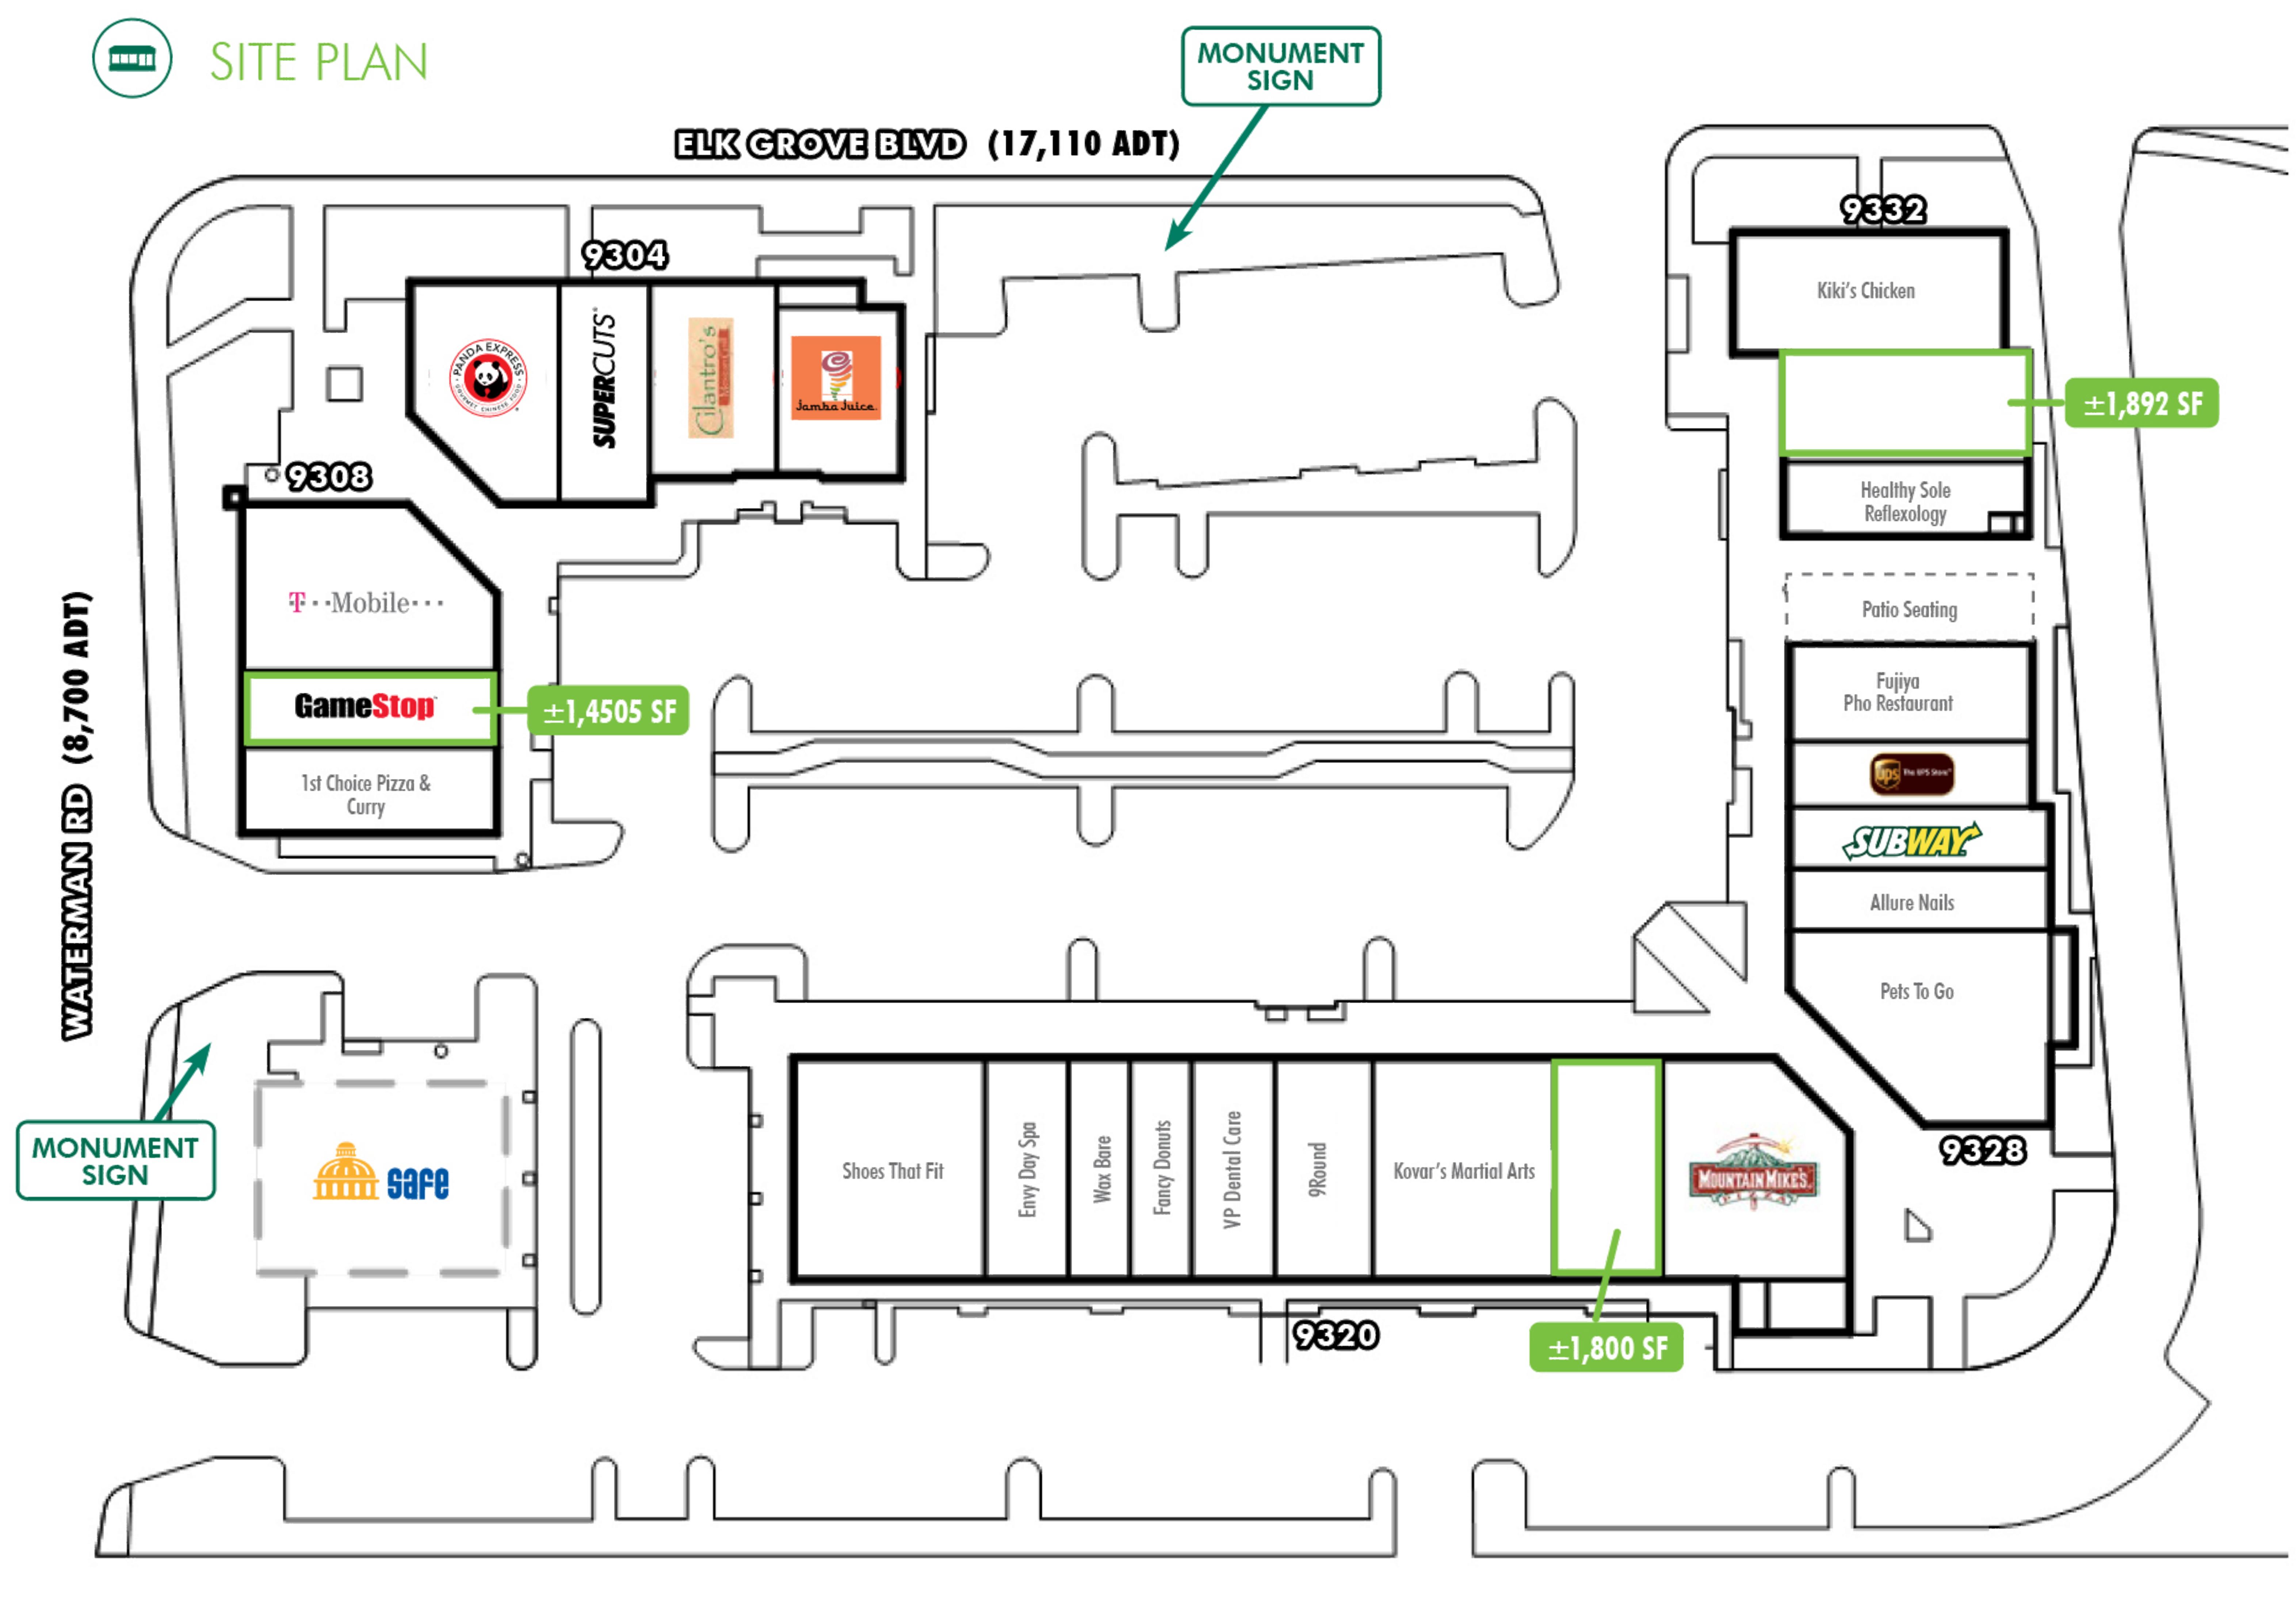 Waterman Grove Plaza: site plan